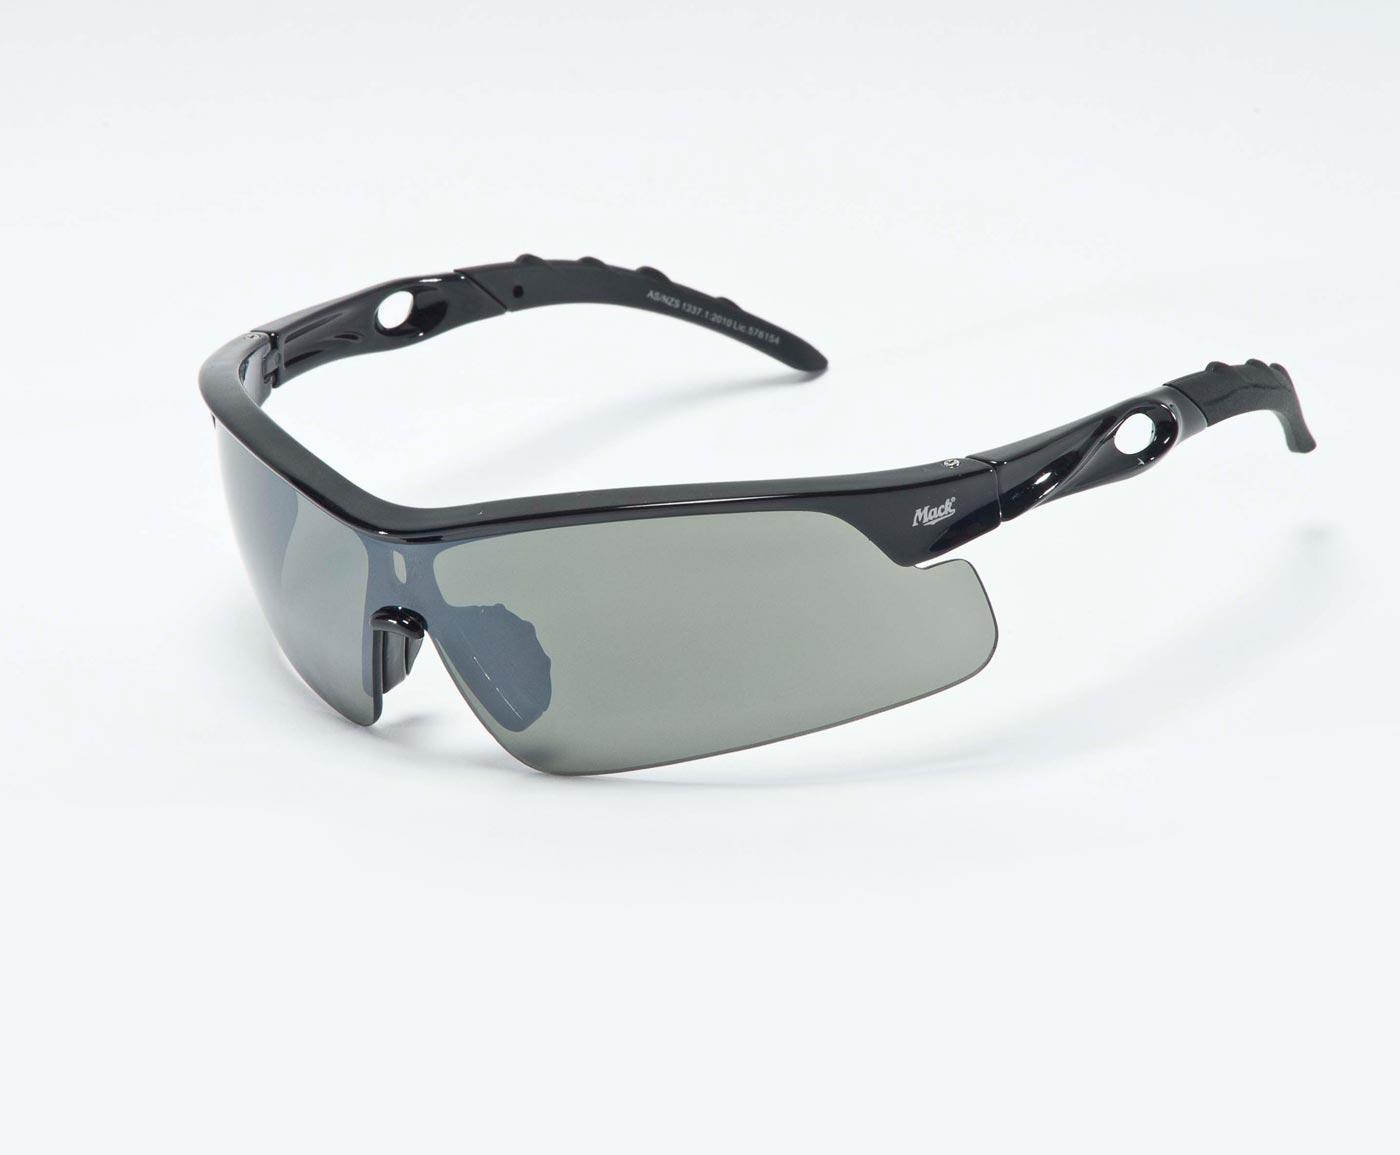 mack hazzard safety glasses safety spec eyewear hazzard